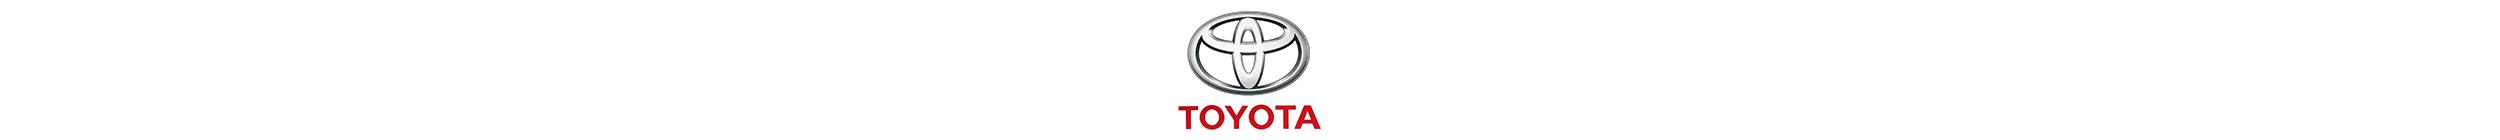 Toyota Long.png